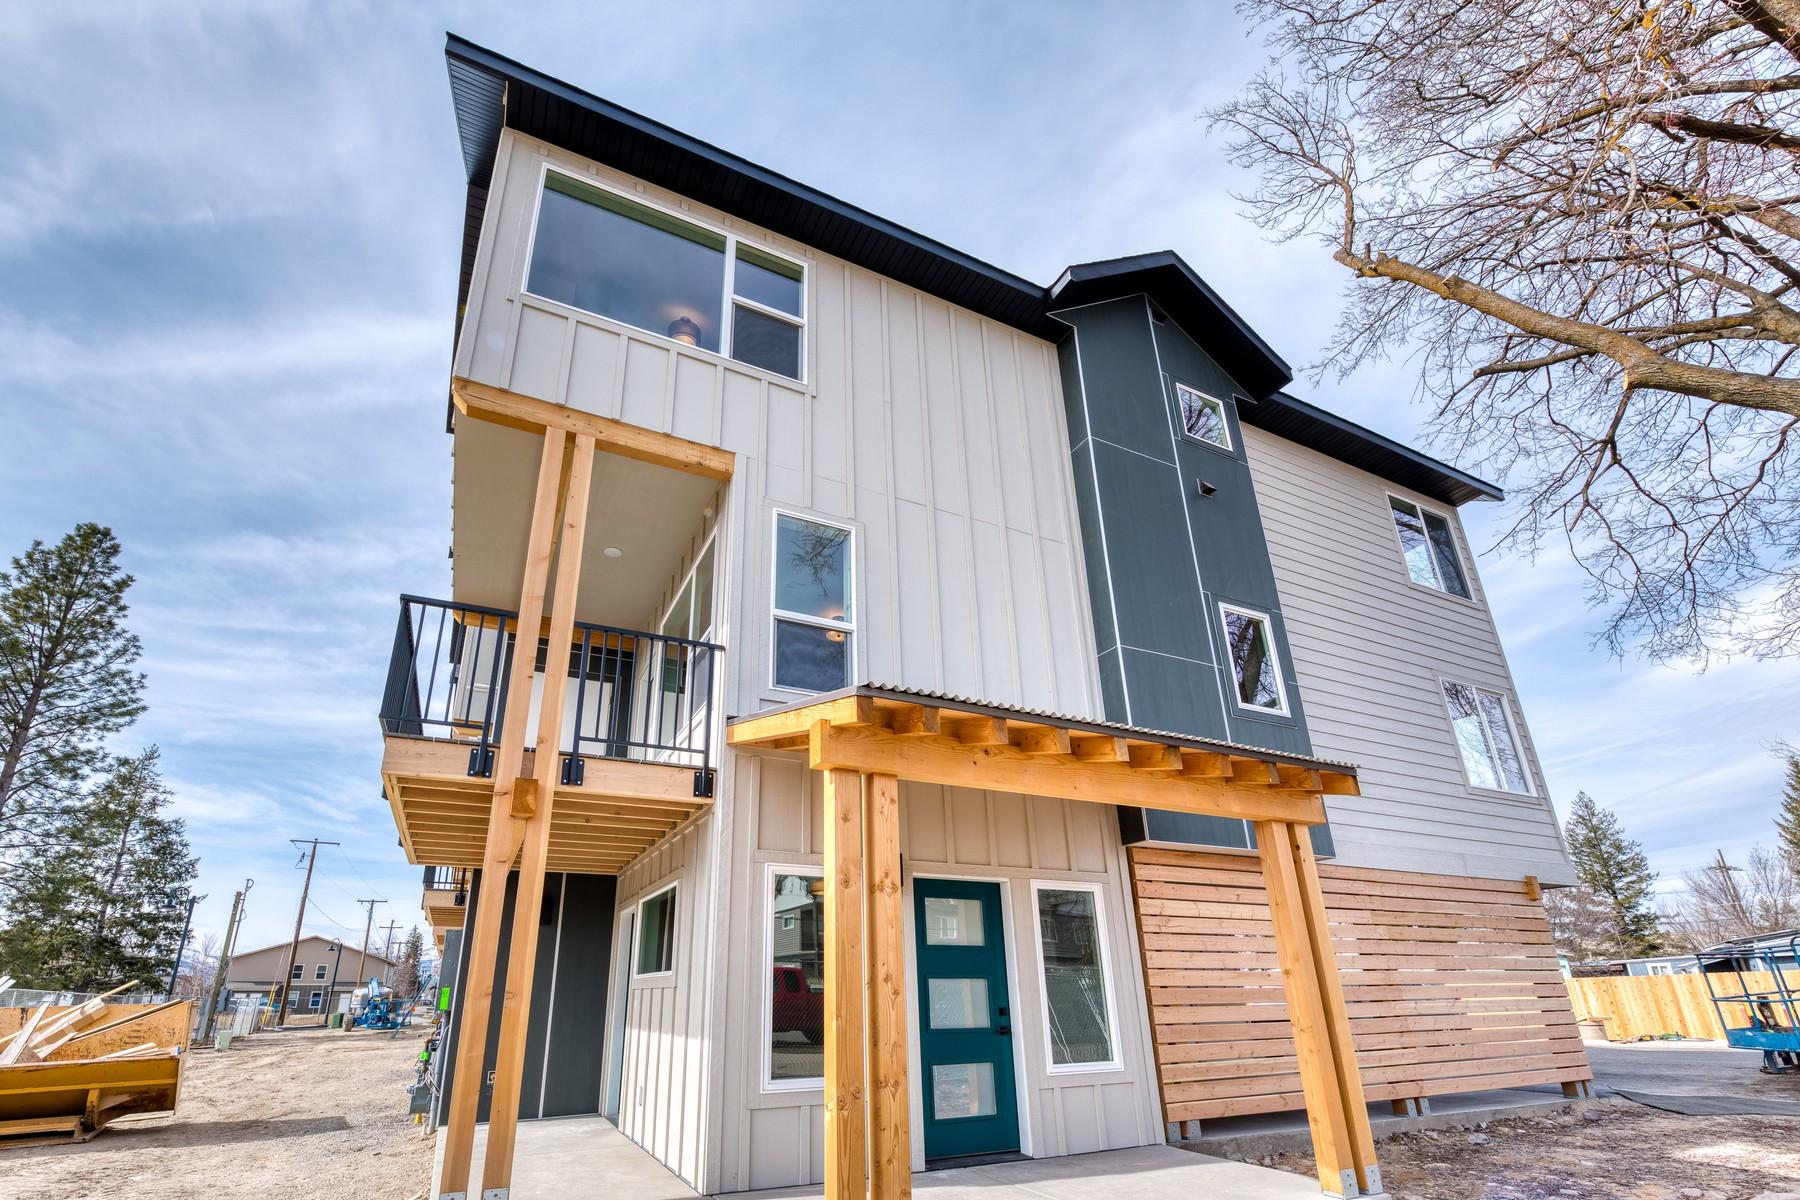 townhouses por un Venta en The Row at Milwaukee Trail 201 C South Catlin Street Missoula, Montana 59801 Estados Unidos